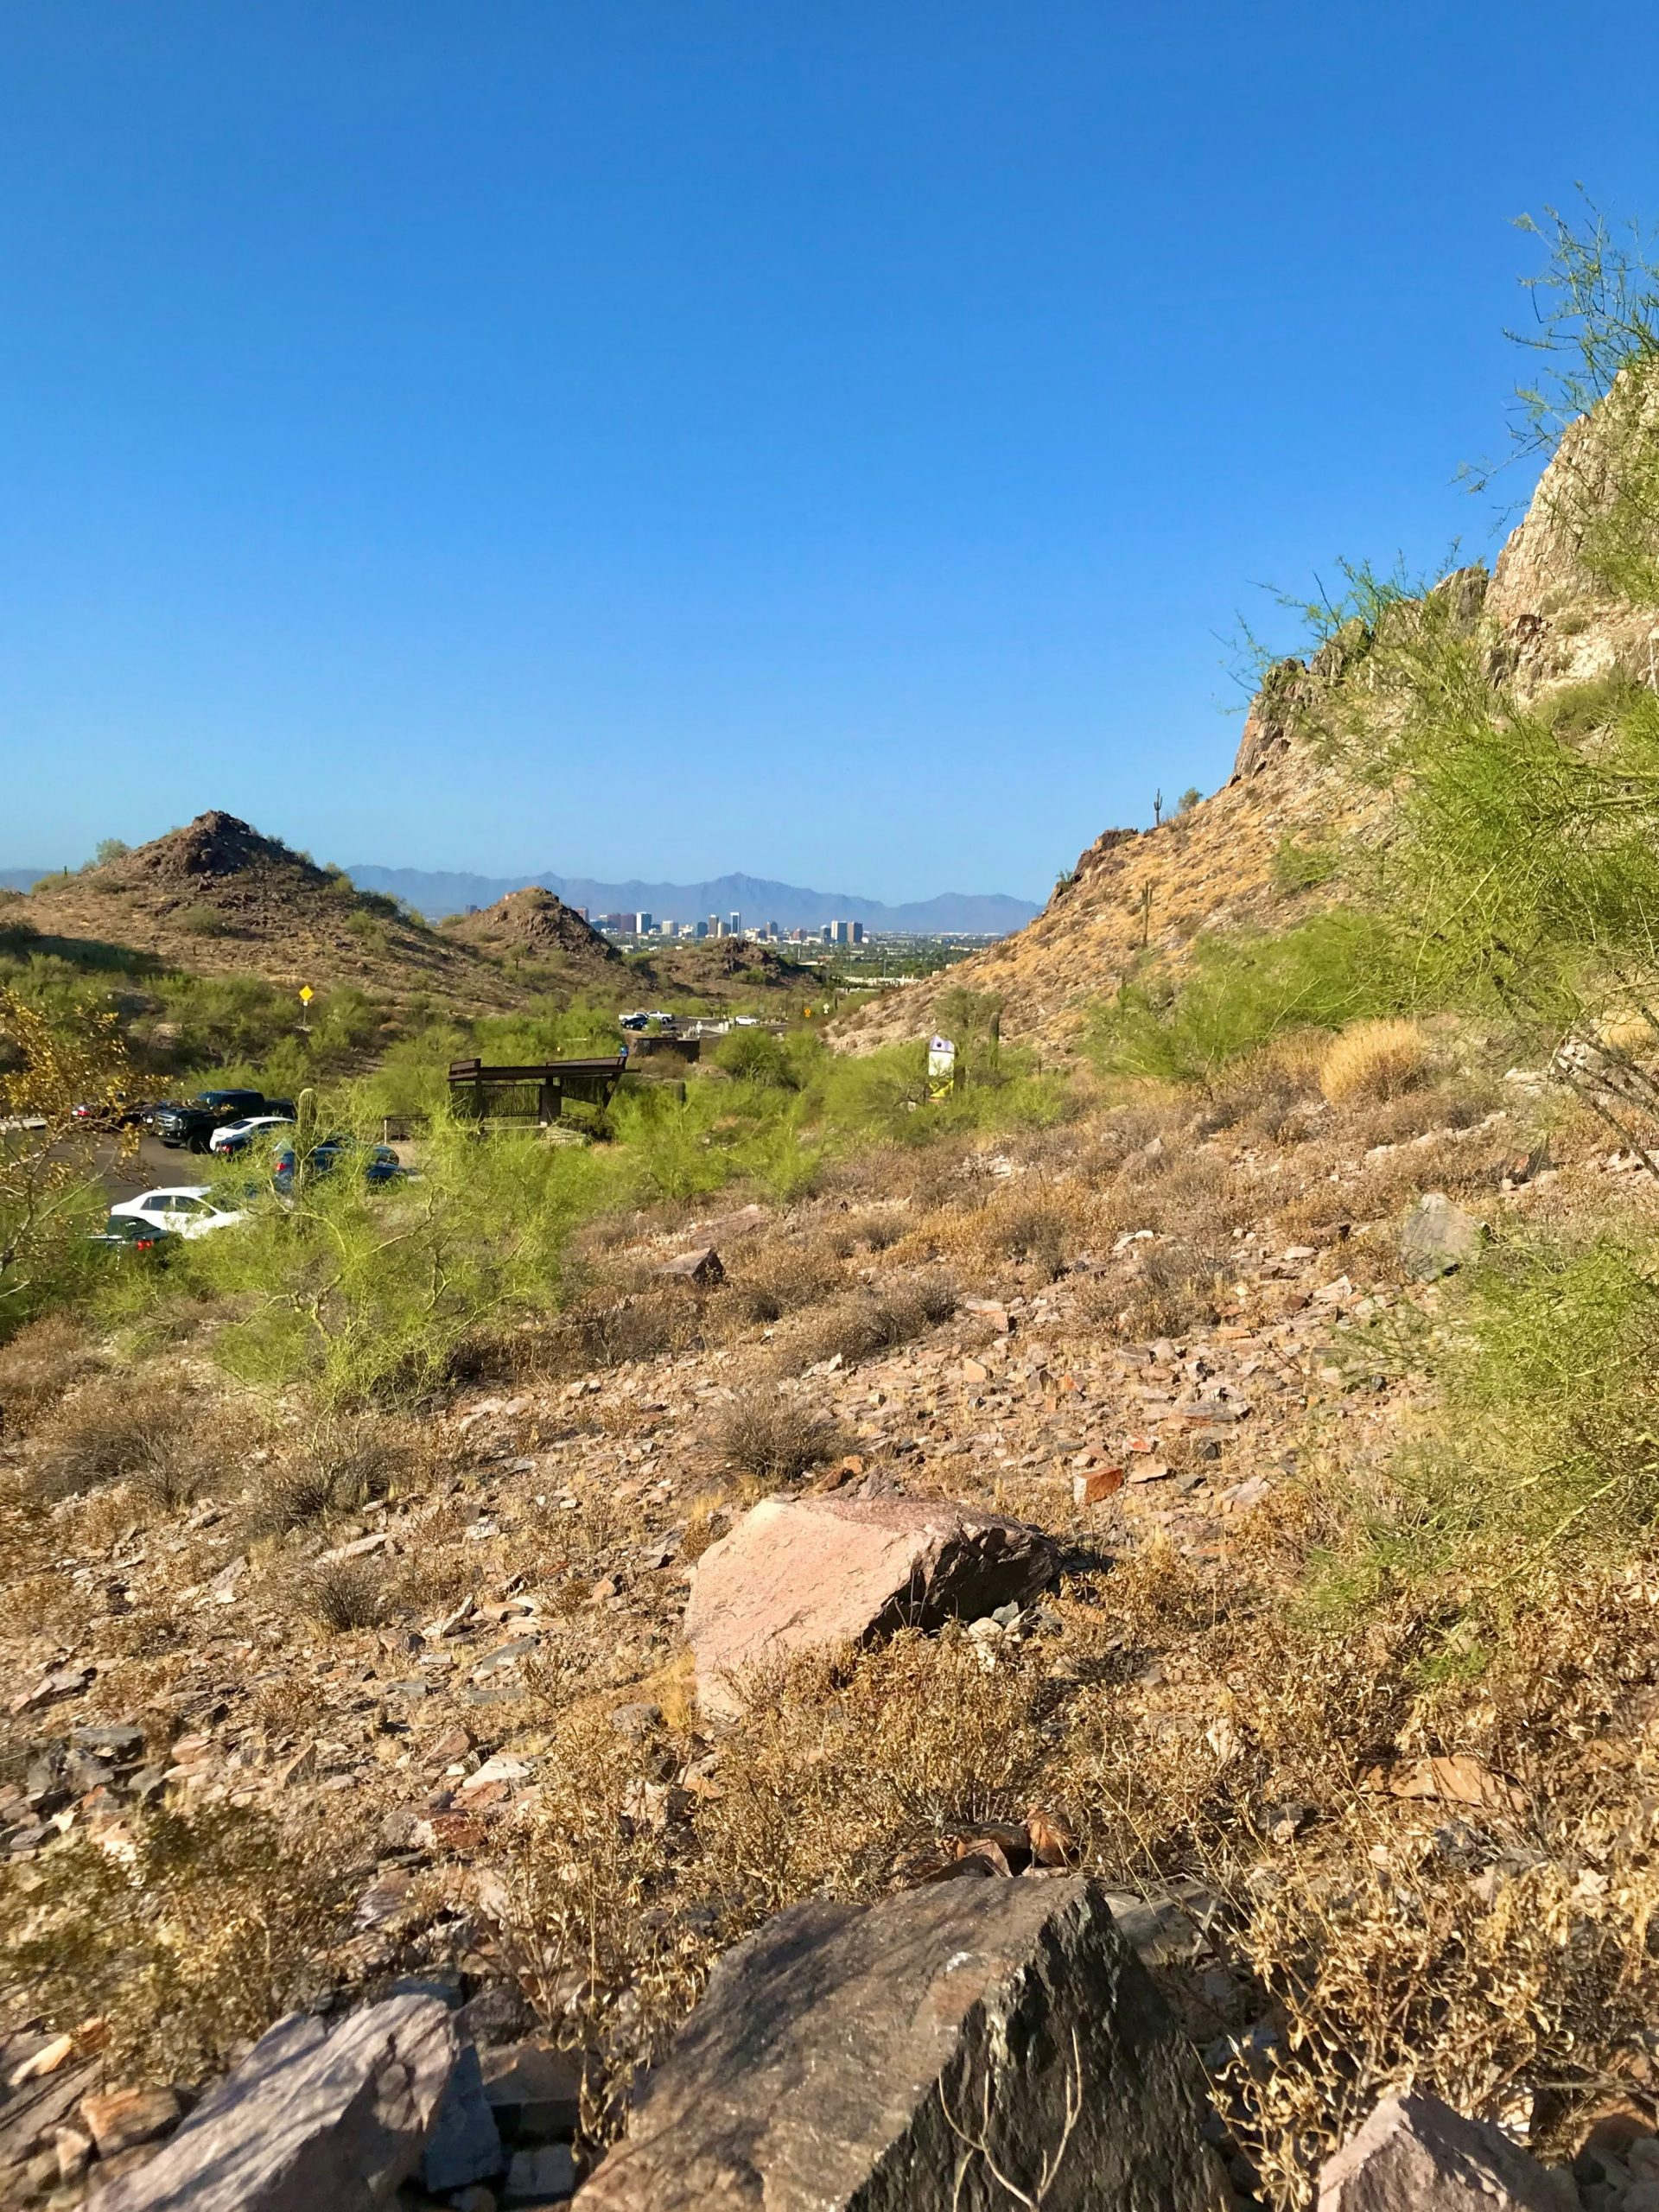 Piestewa vs Camelback? Which should you hike? Piestewa city views 3